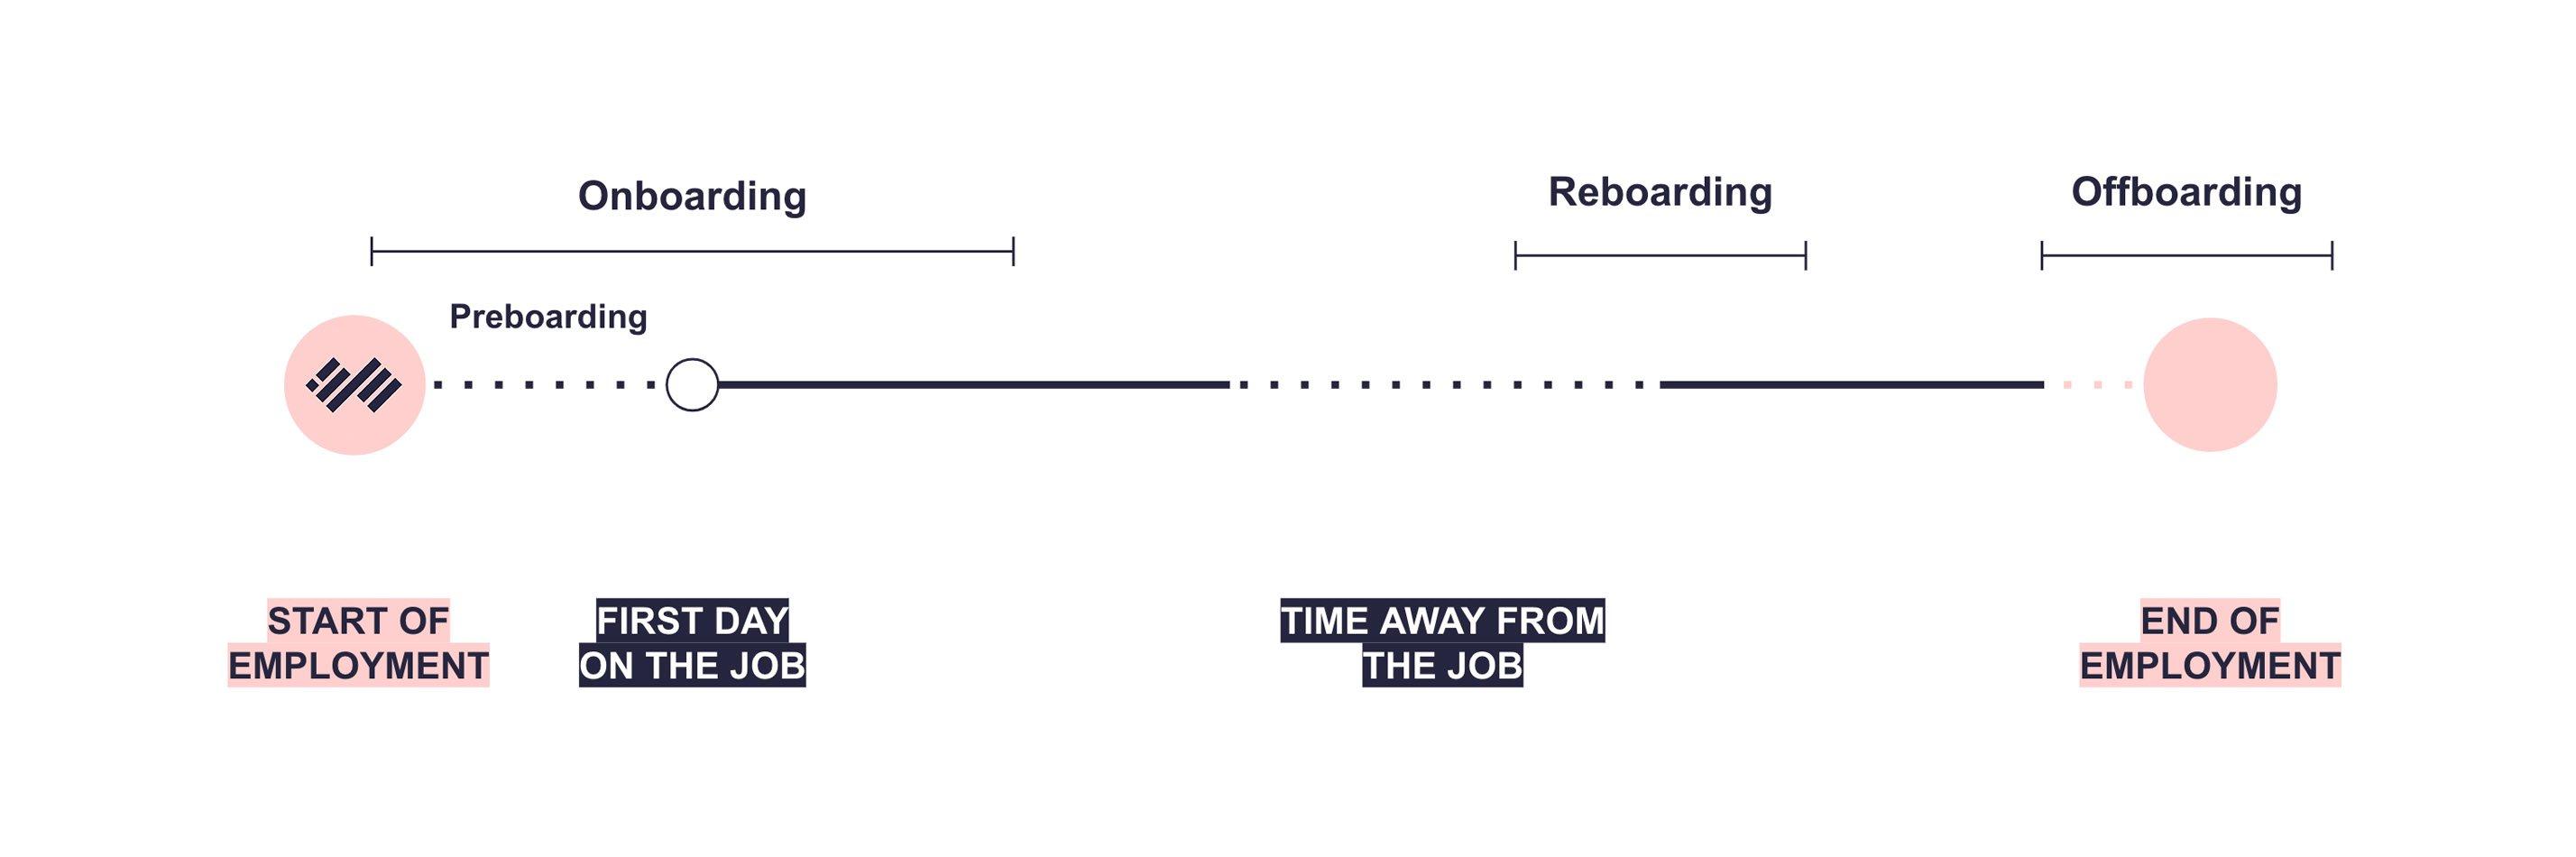 Talmundo Employee Transistions Timeline  copy